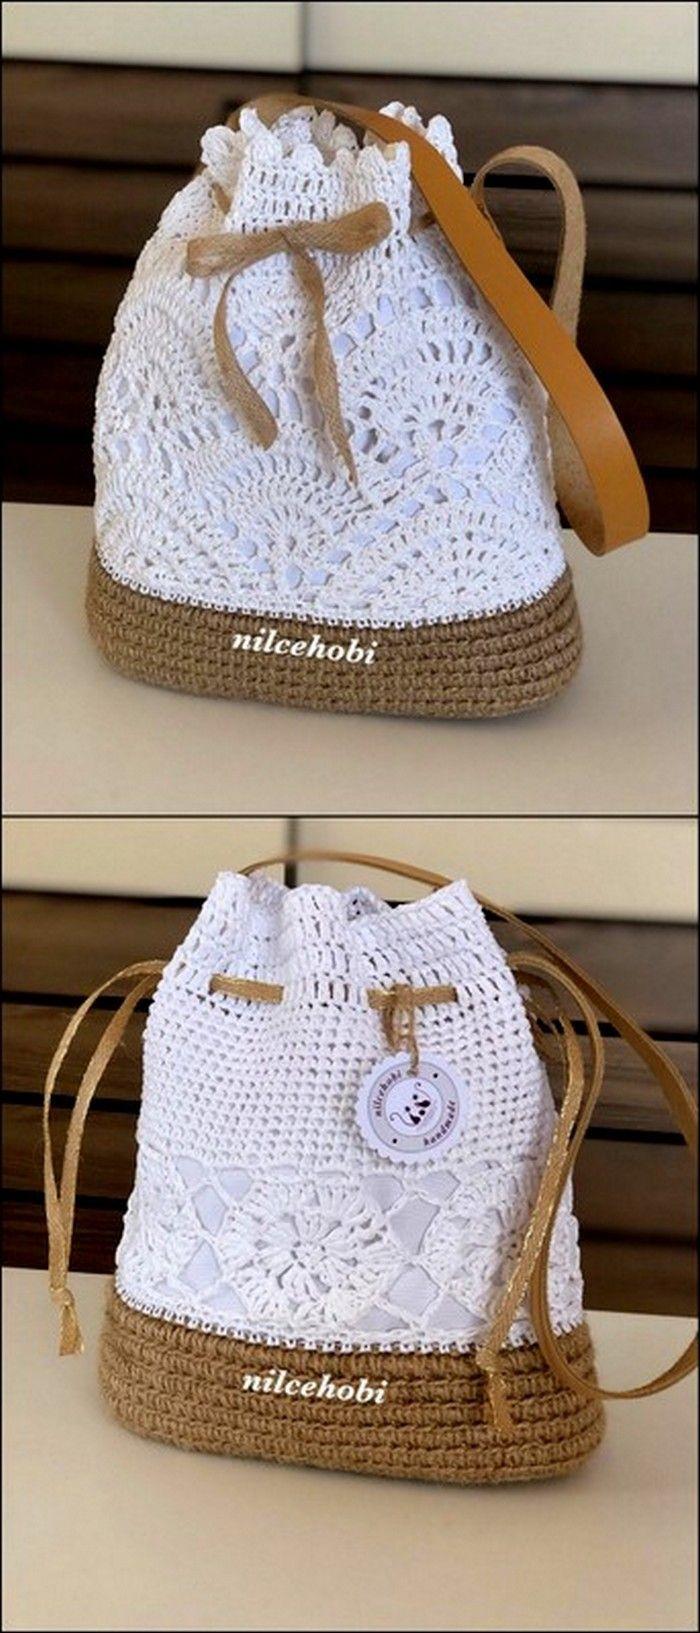 Stylish Strap bag Free Crochet Pattern